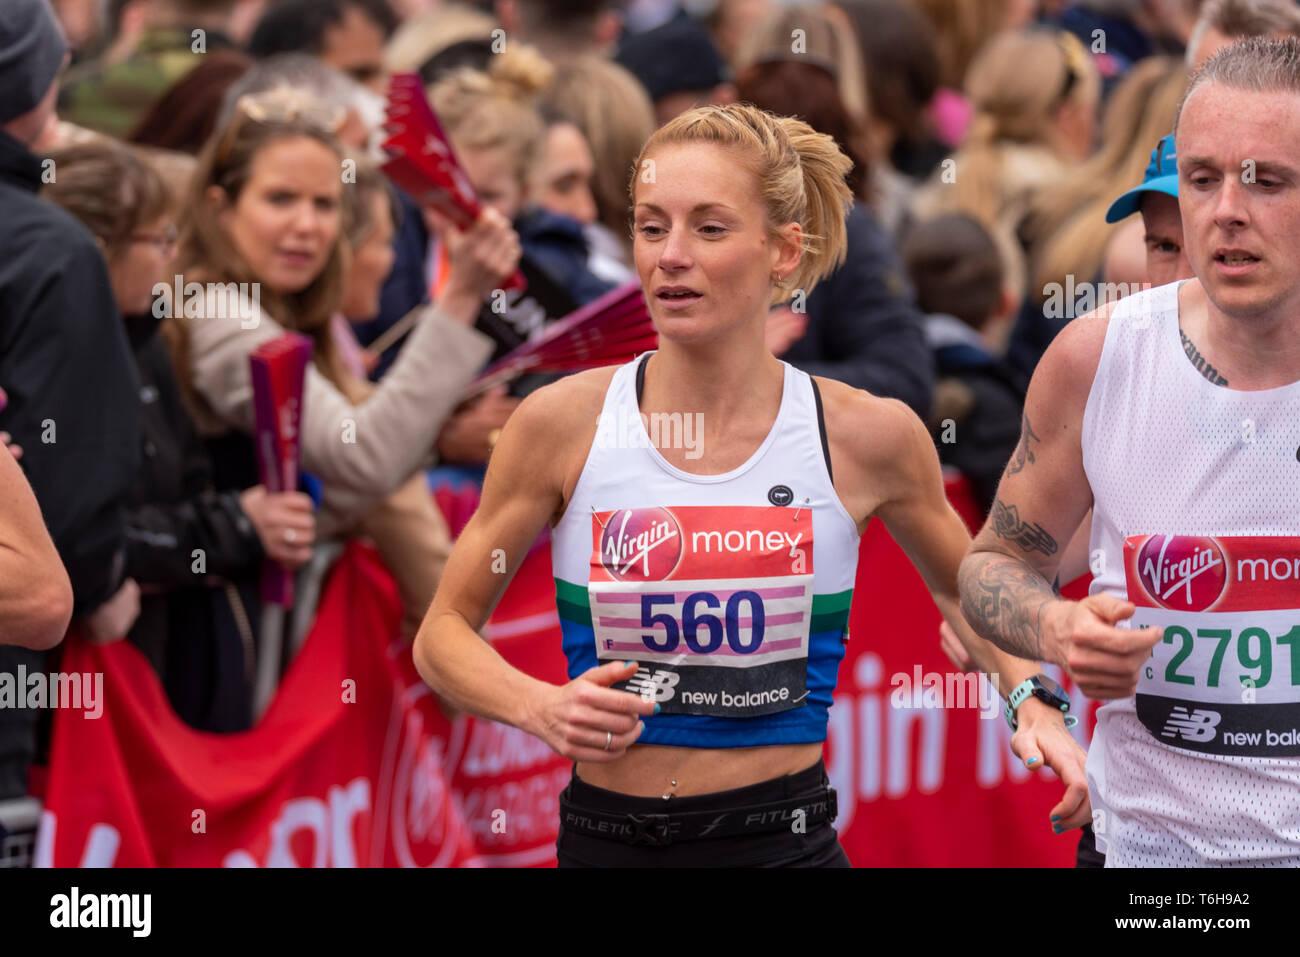 stephanie-davis-560-racing-at-the-virgin-money-london-marathon-2019-uk-T6H9A2.jpg